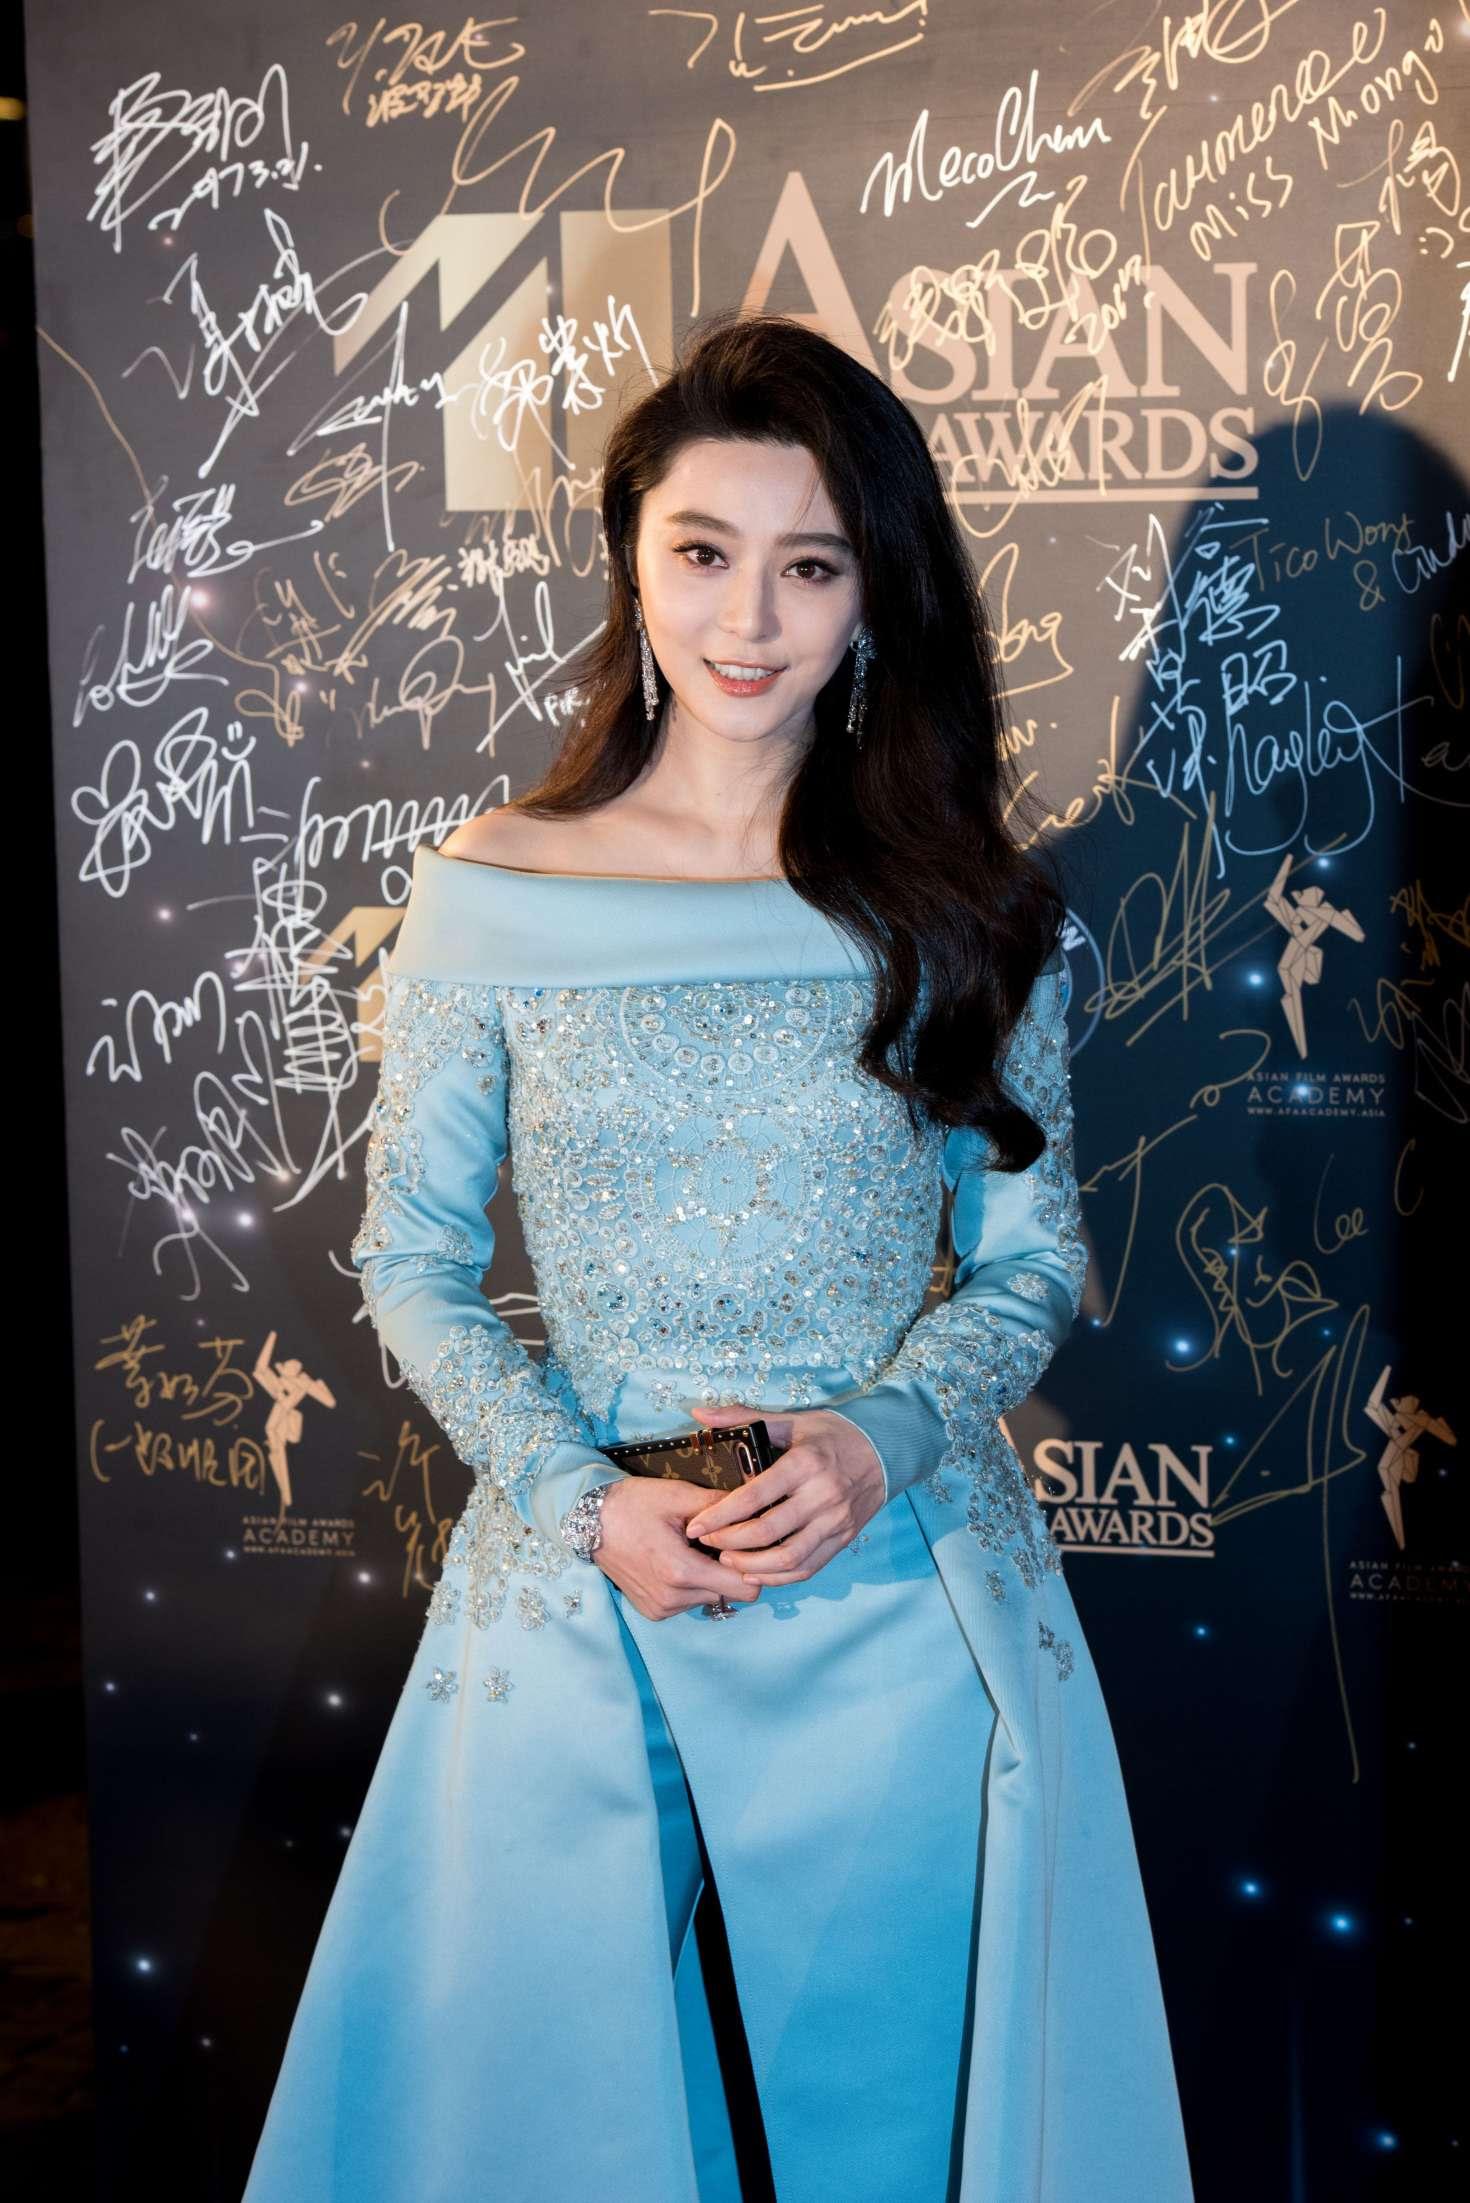 Fan BingBing at 11th Asian Film Awards in Hong Kong